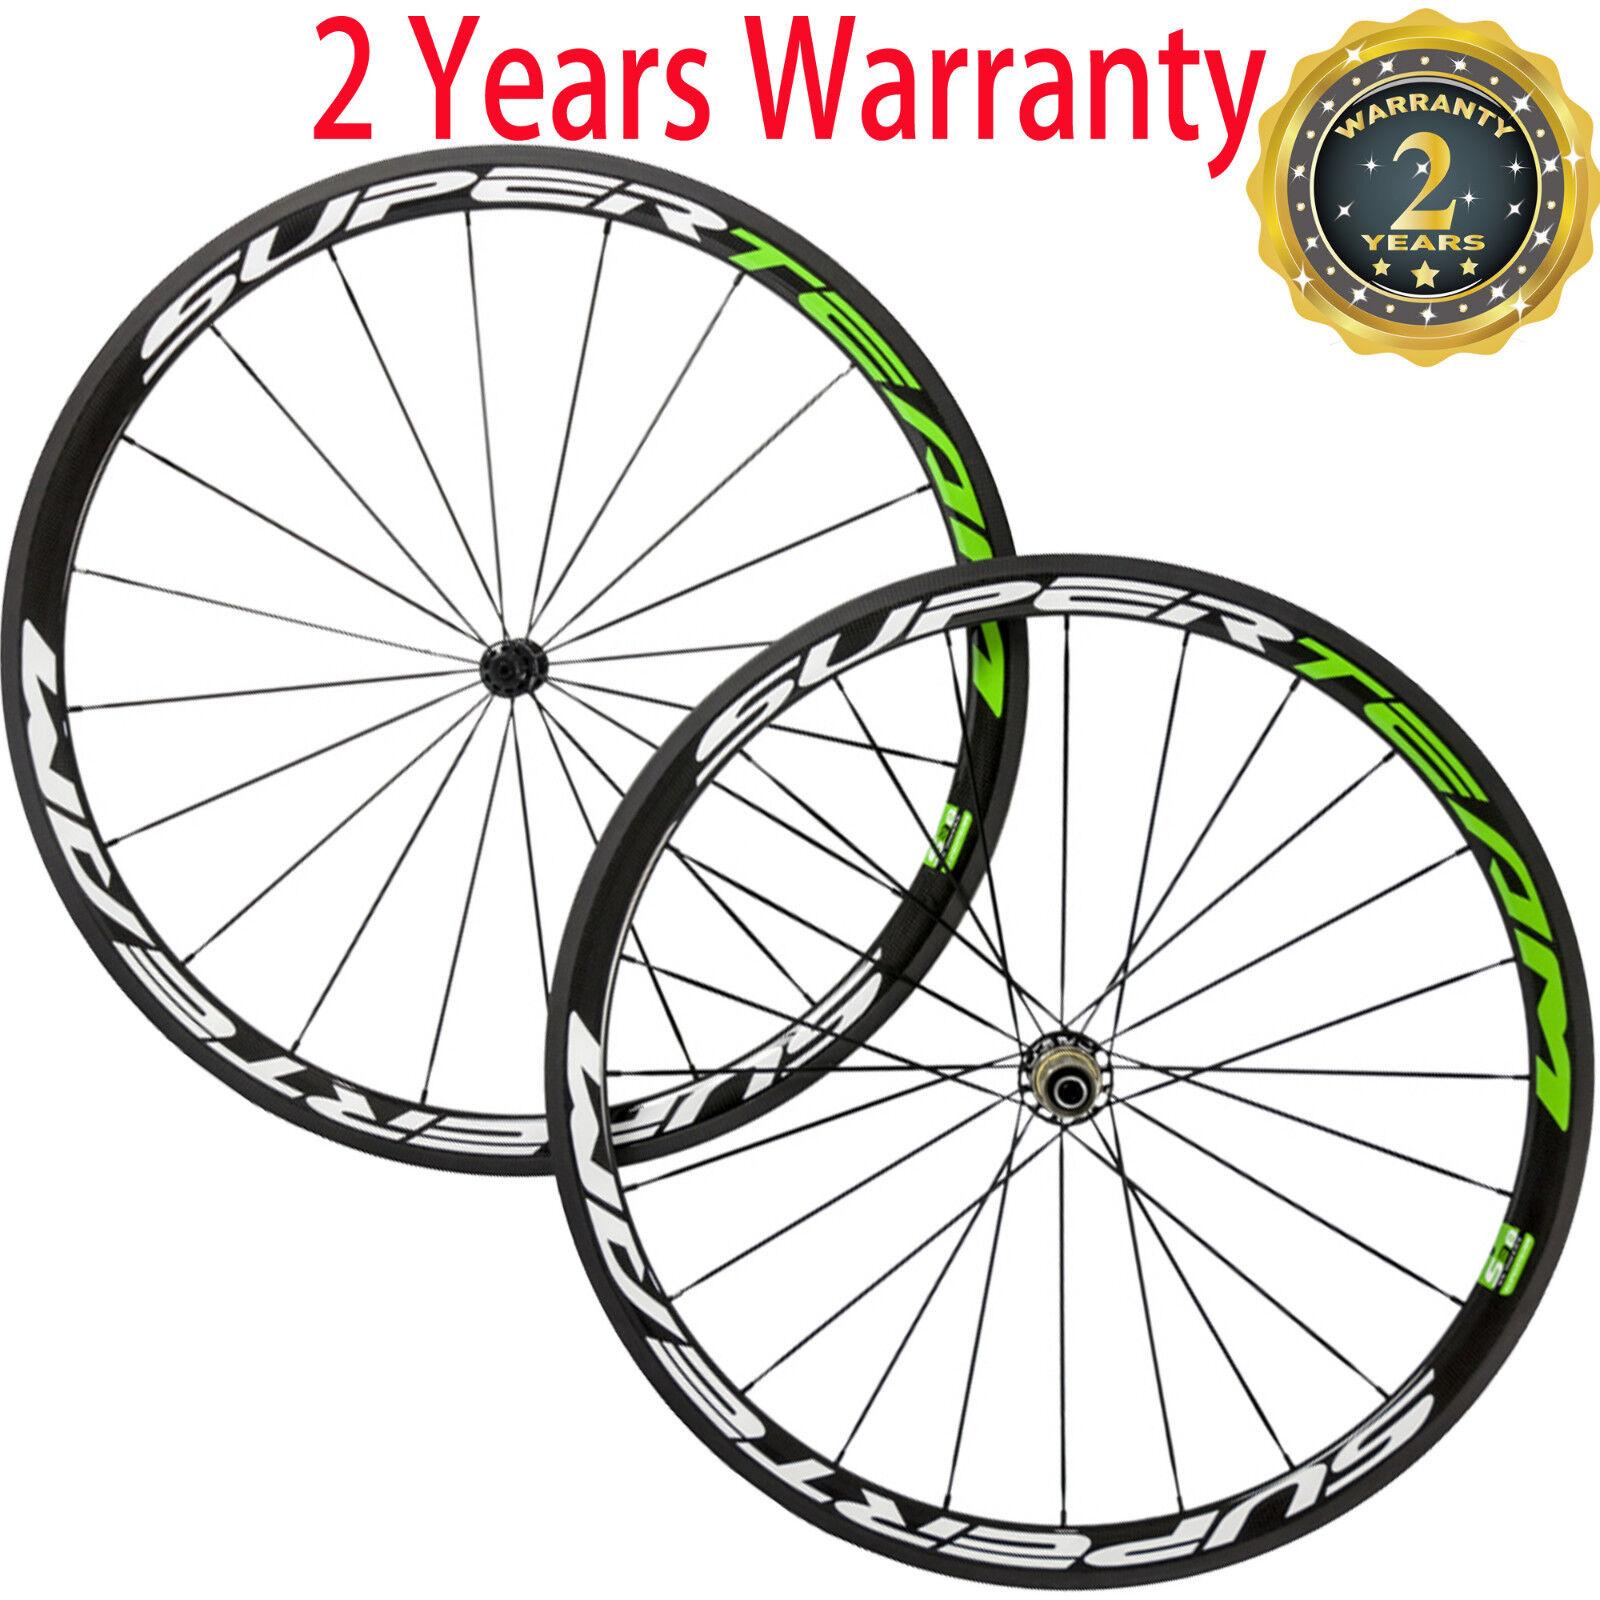 Carbon Wheels 38mm Road Bike  Cycling Race Wheelset Powerway R39 Hub 700C Bicycle  offering store